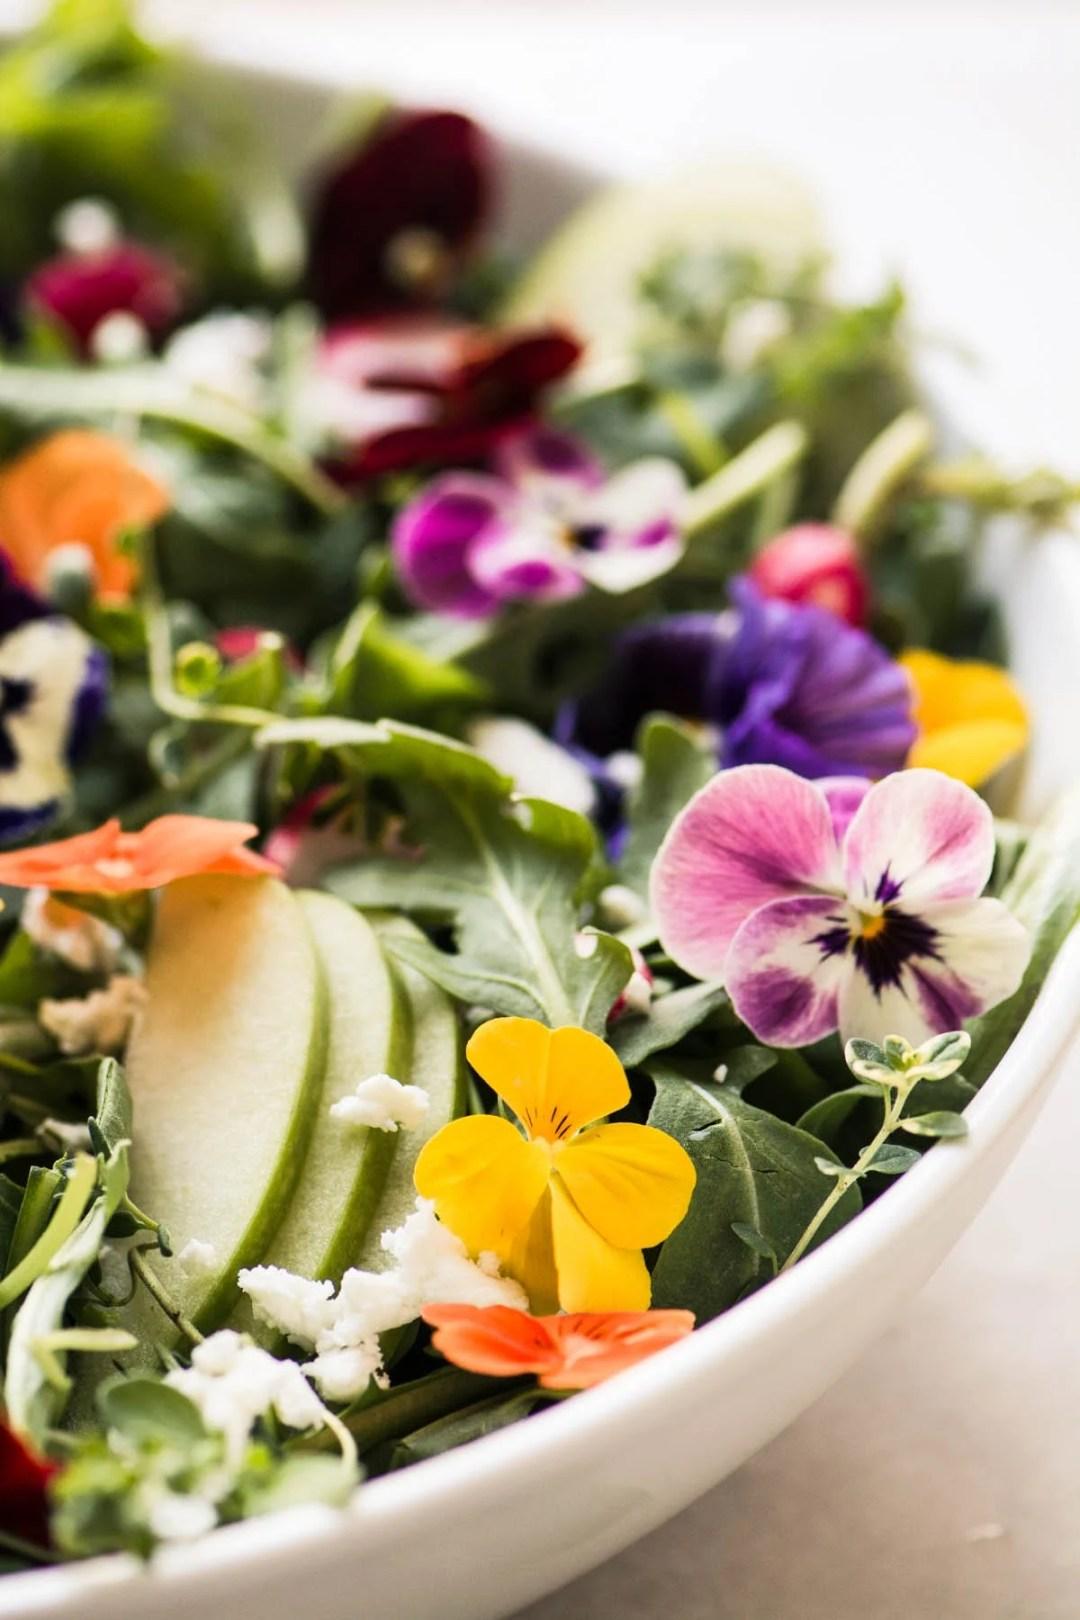 Winter Pansy Salad